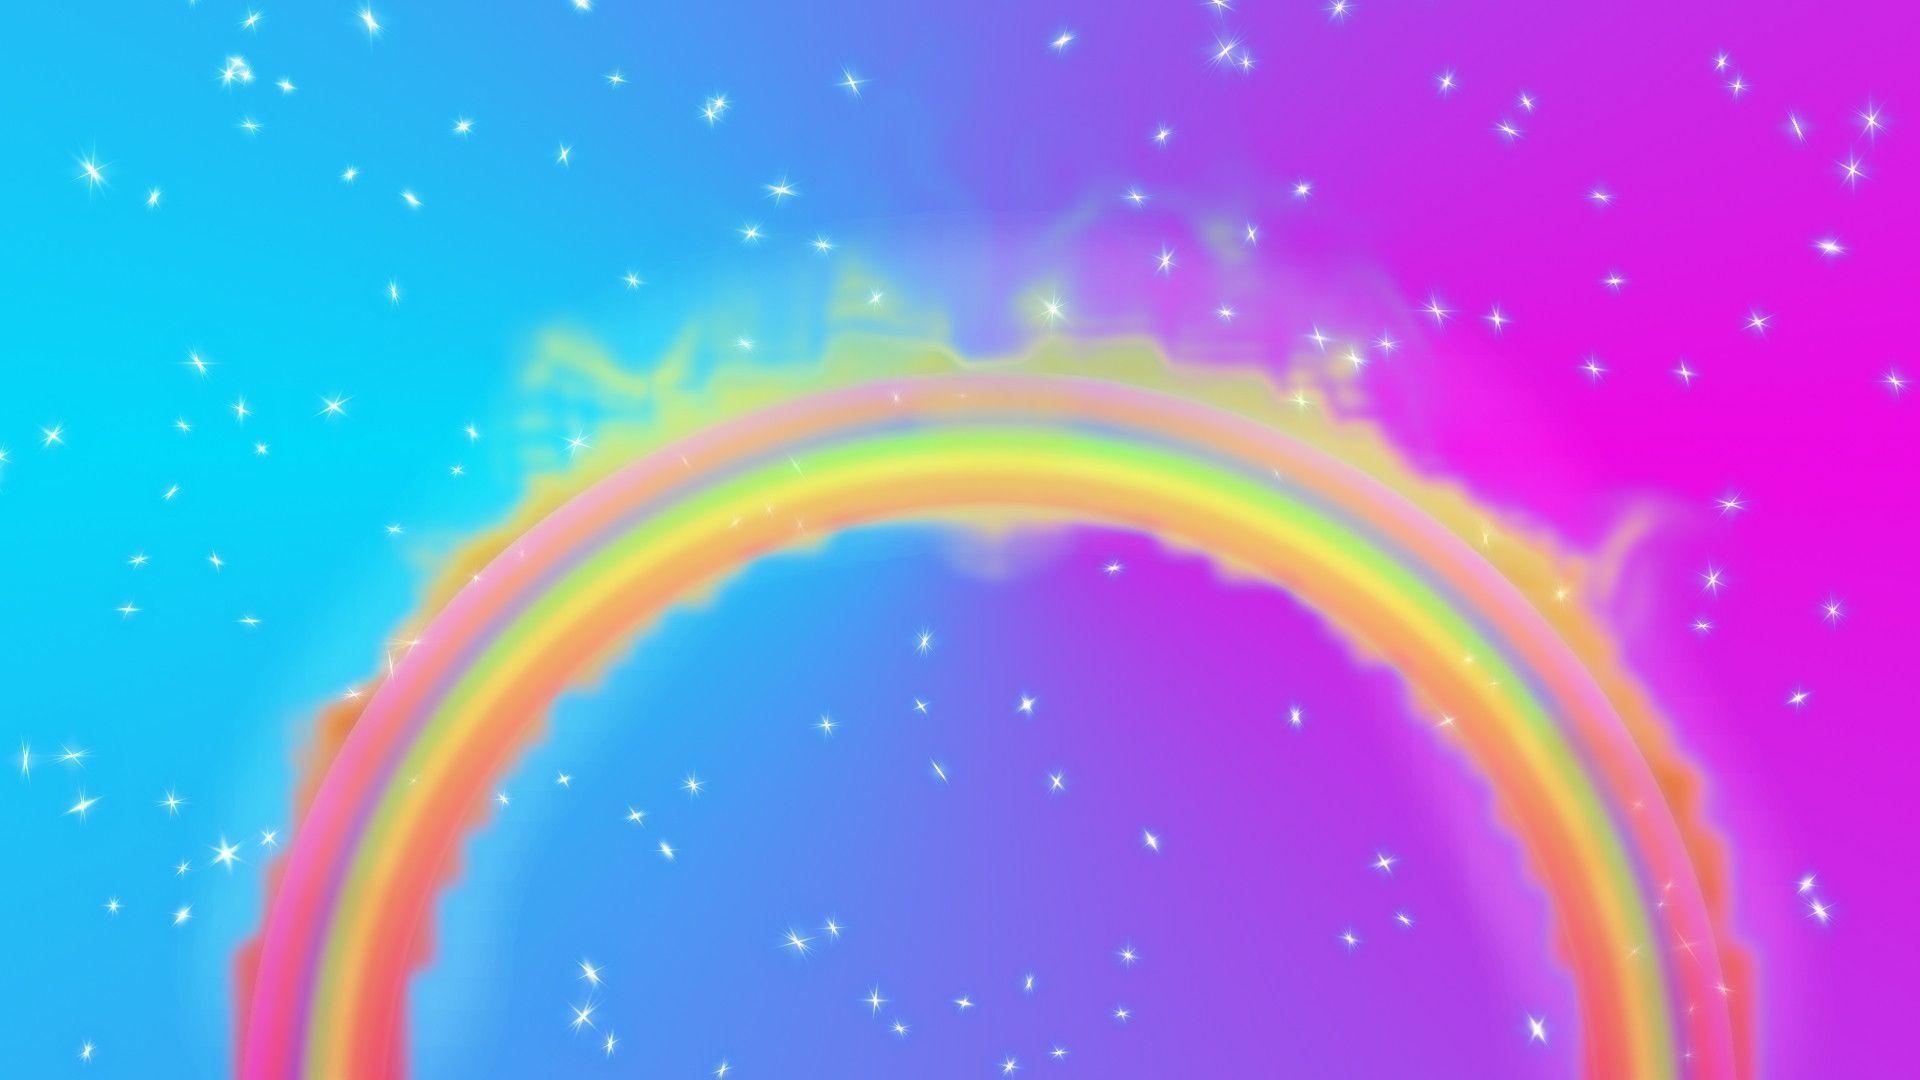 Rainbow Background wallpaper – 1189552